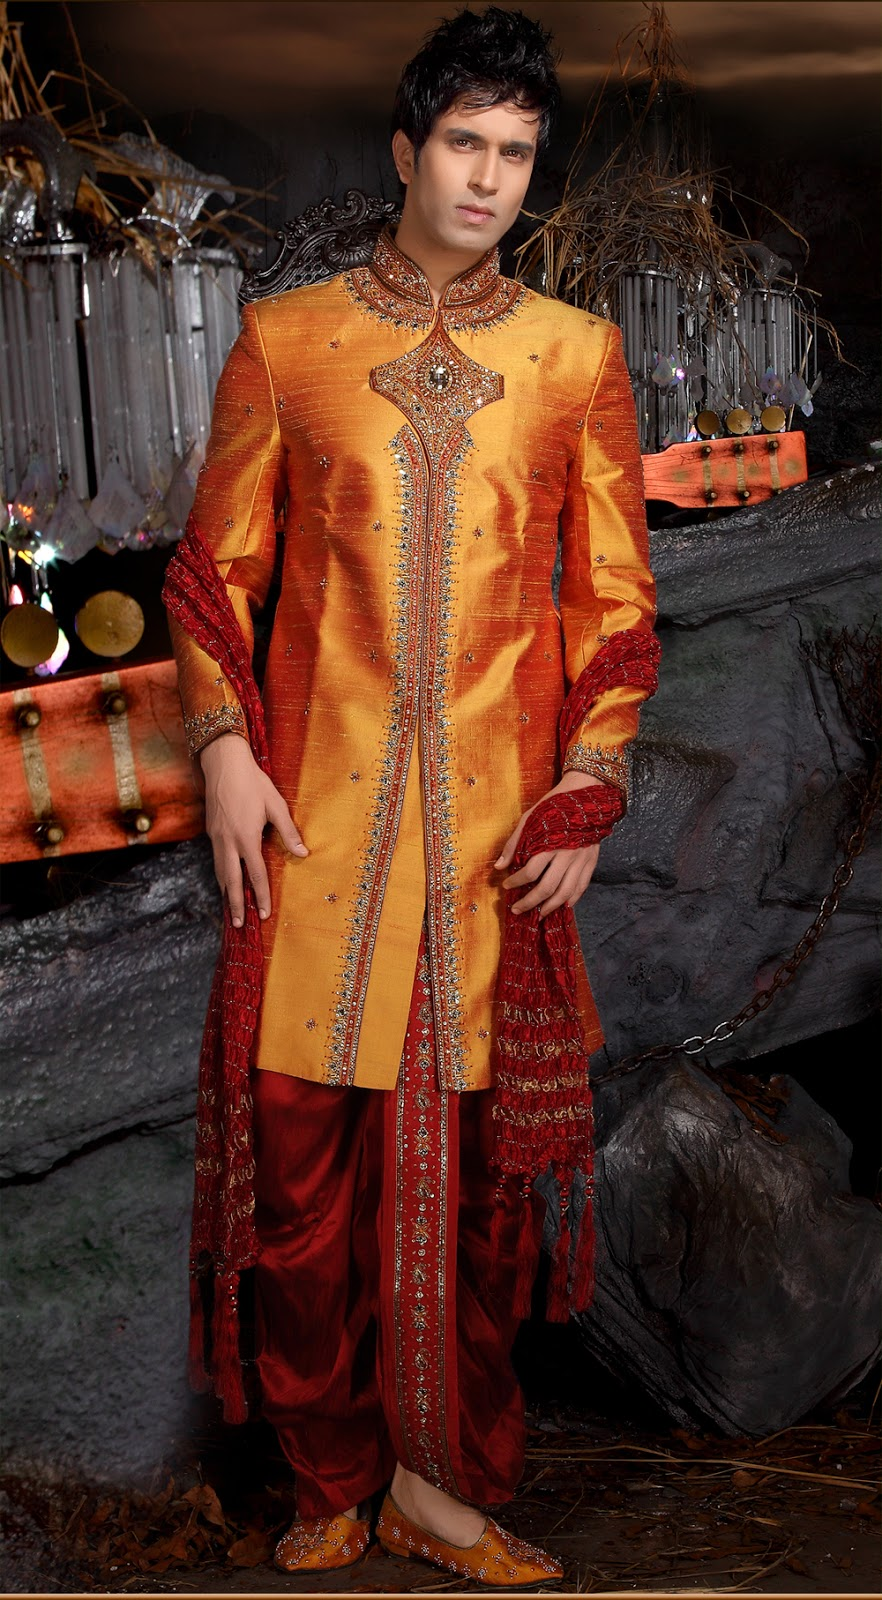 CULTURE DRESSES OF INDIA ~ Massalanews